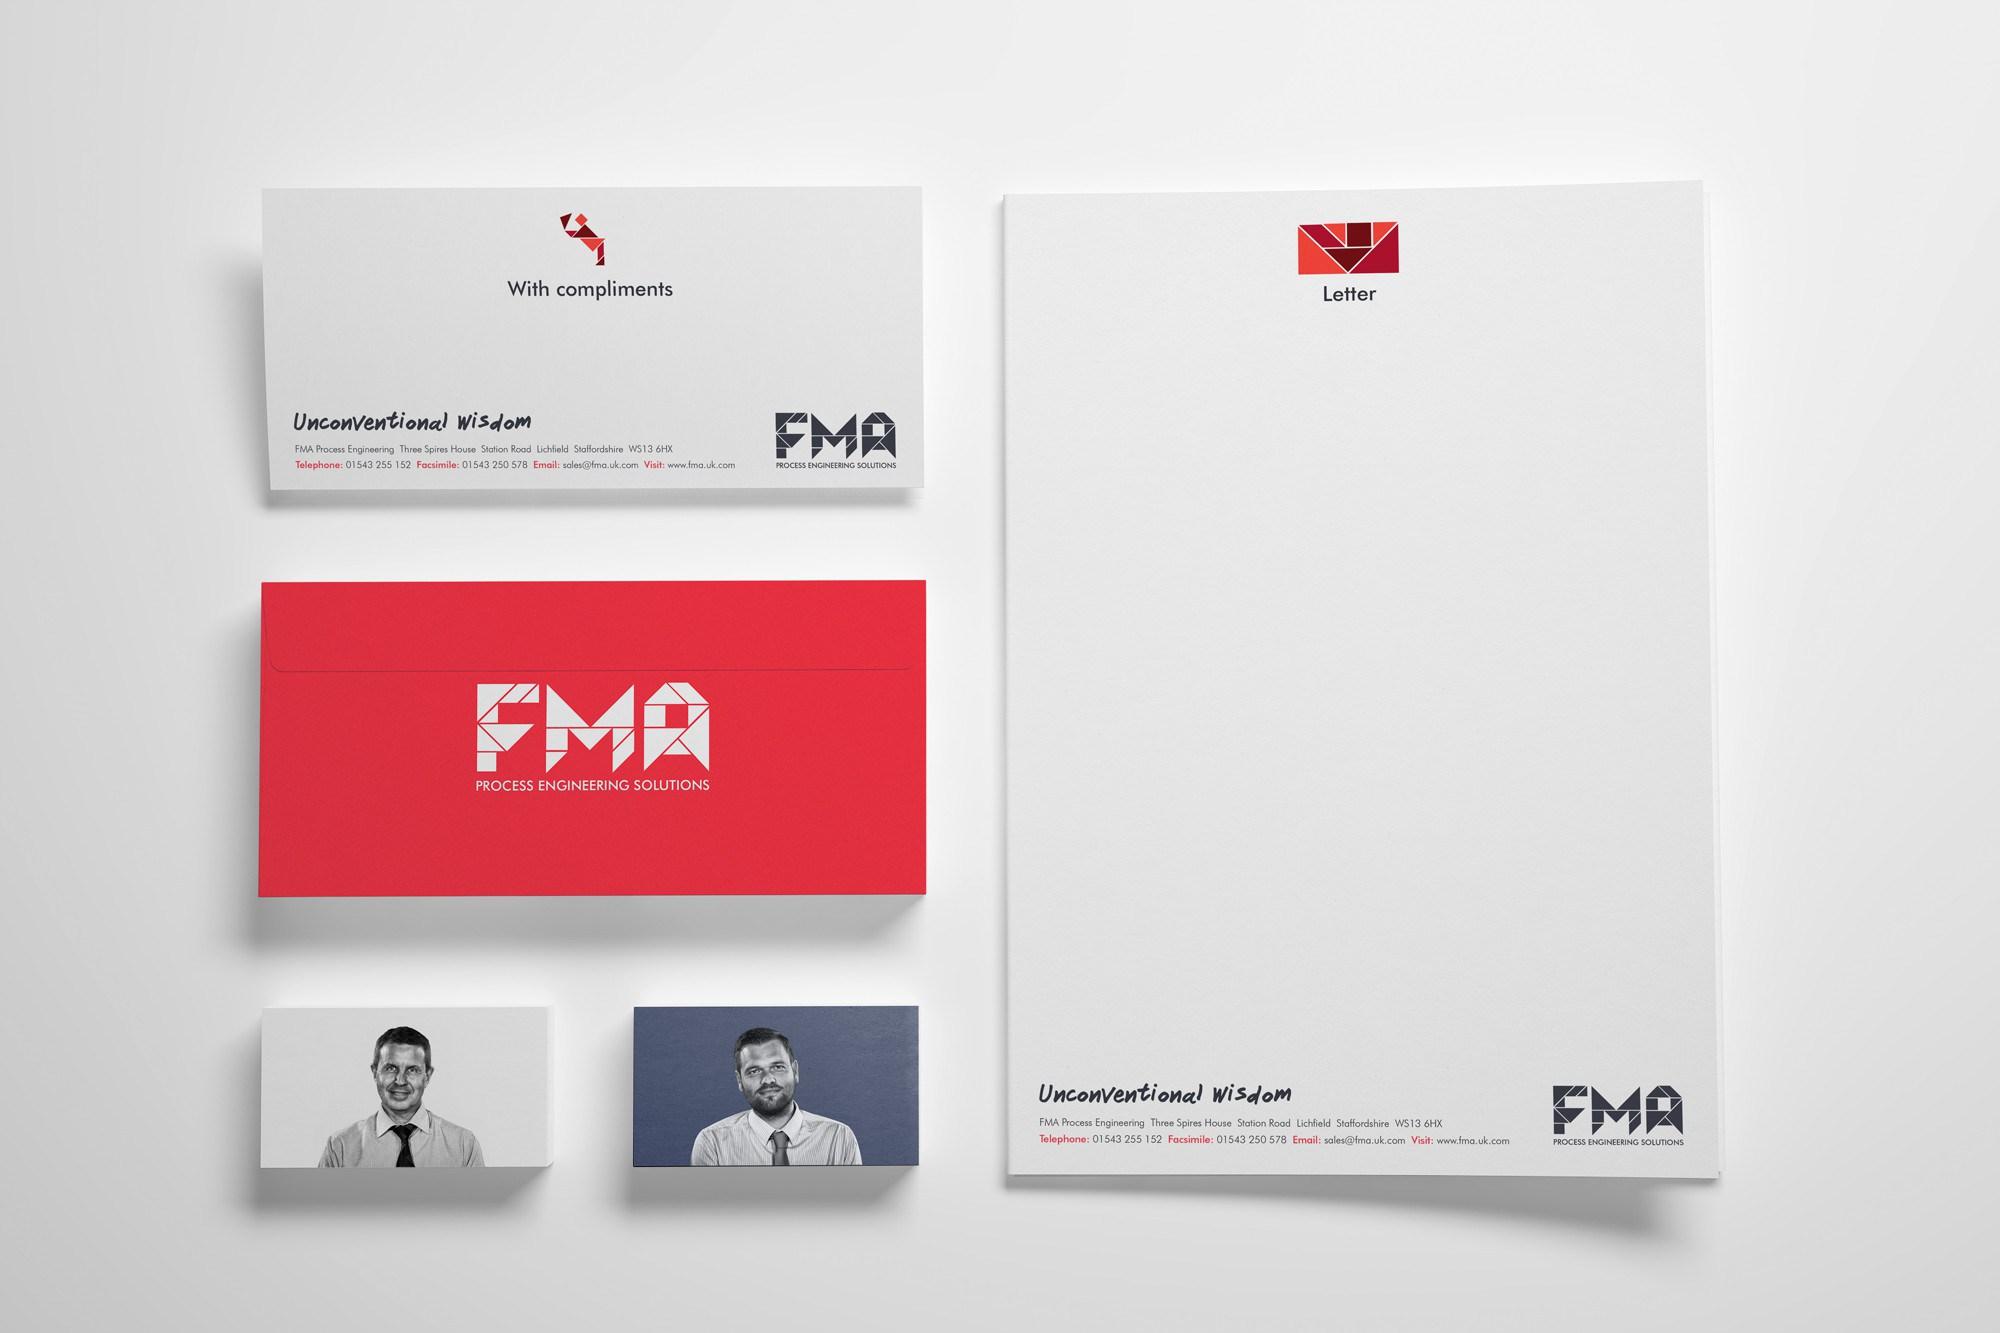 FMA stationery